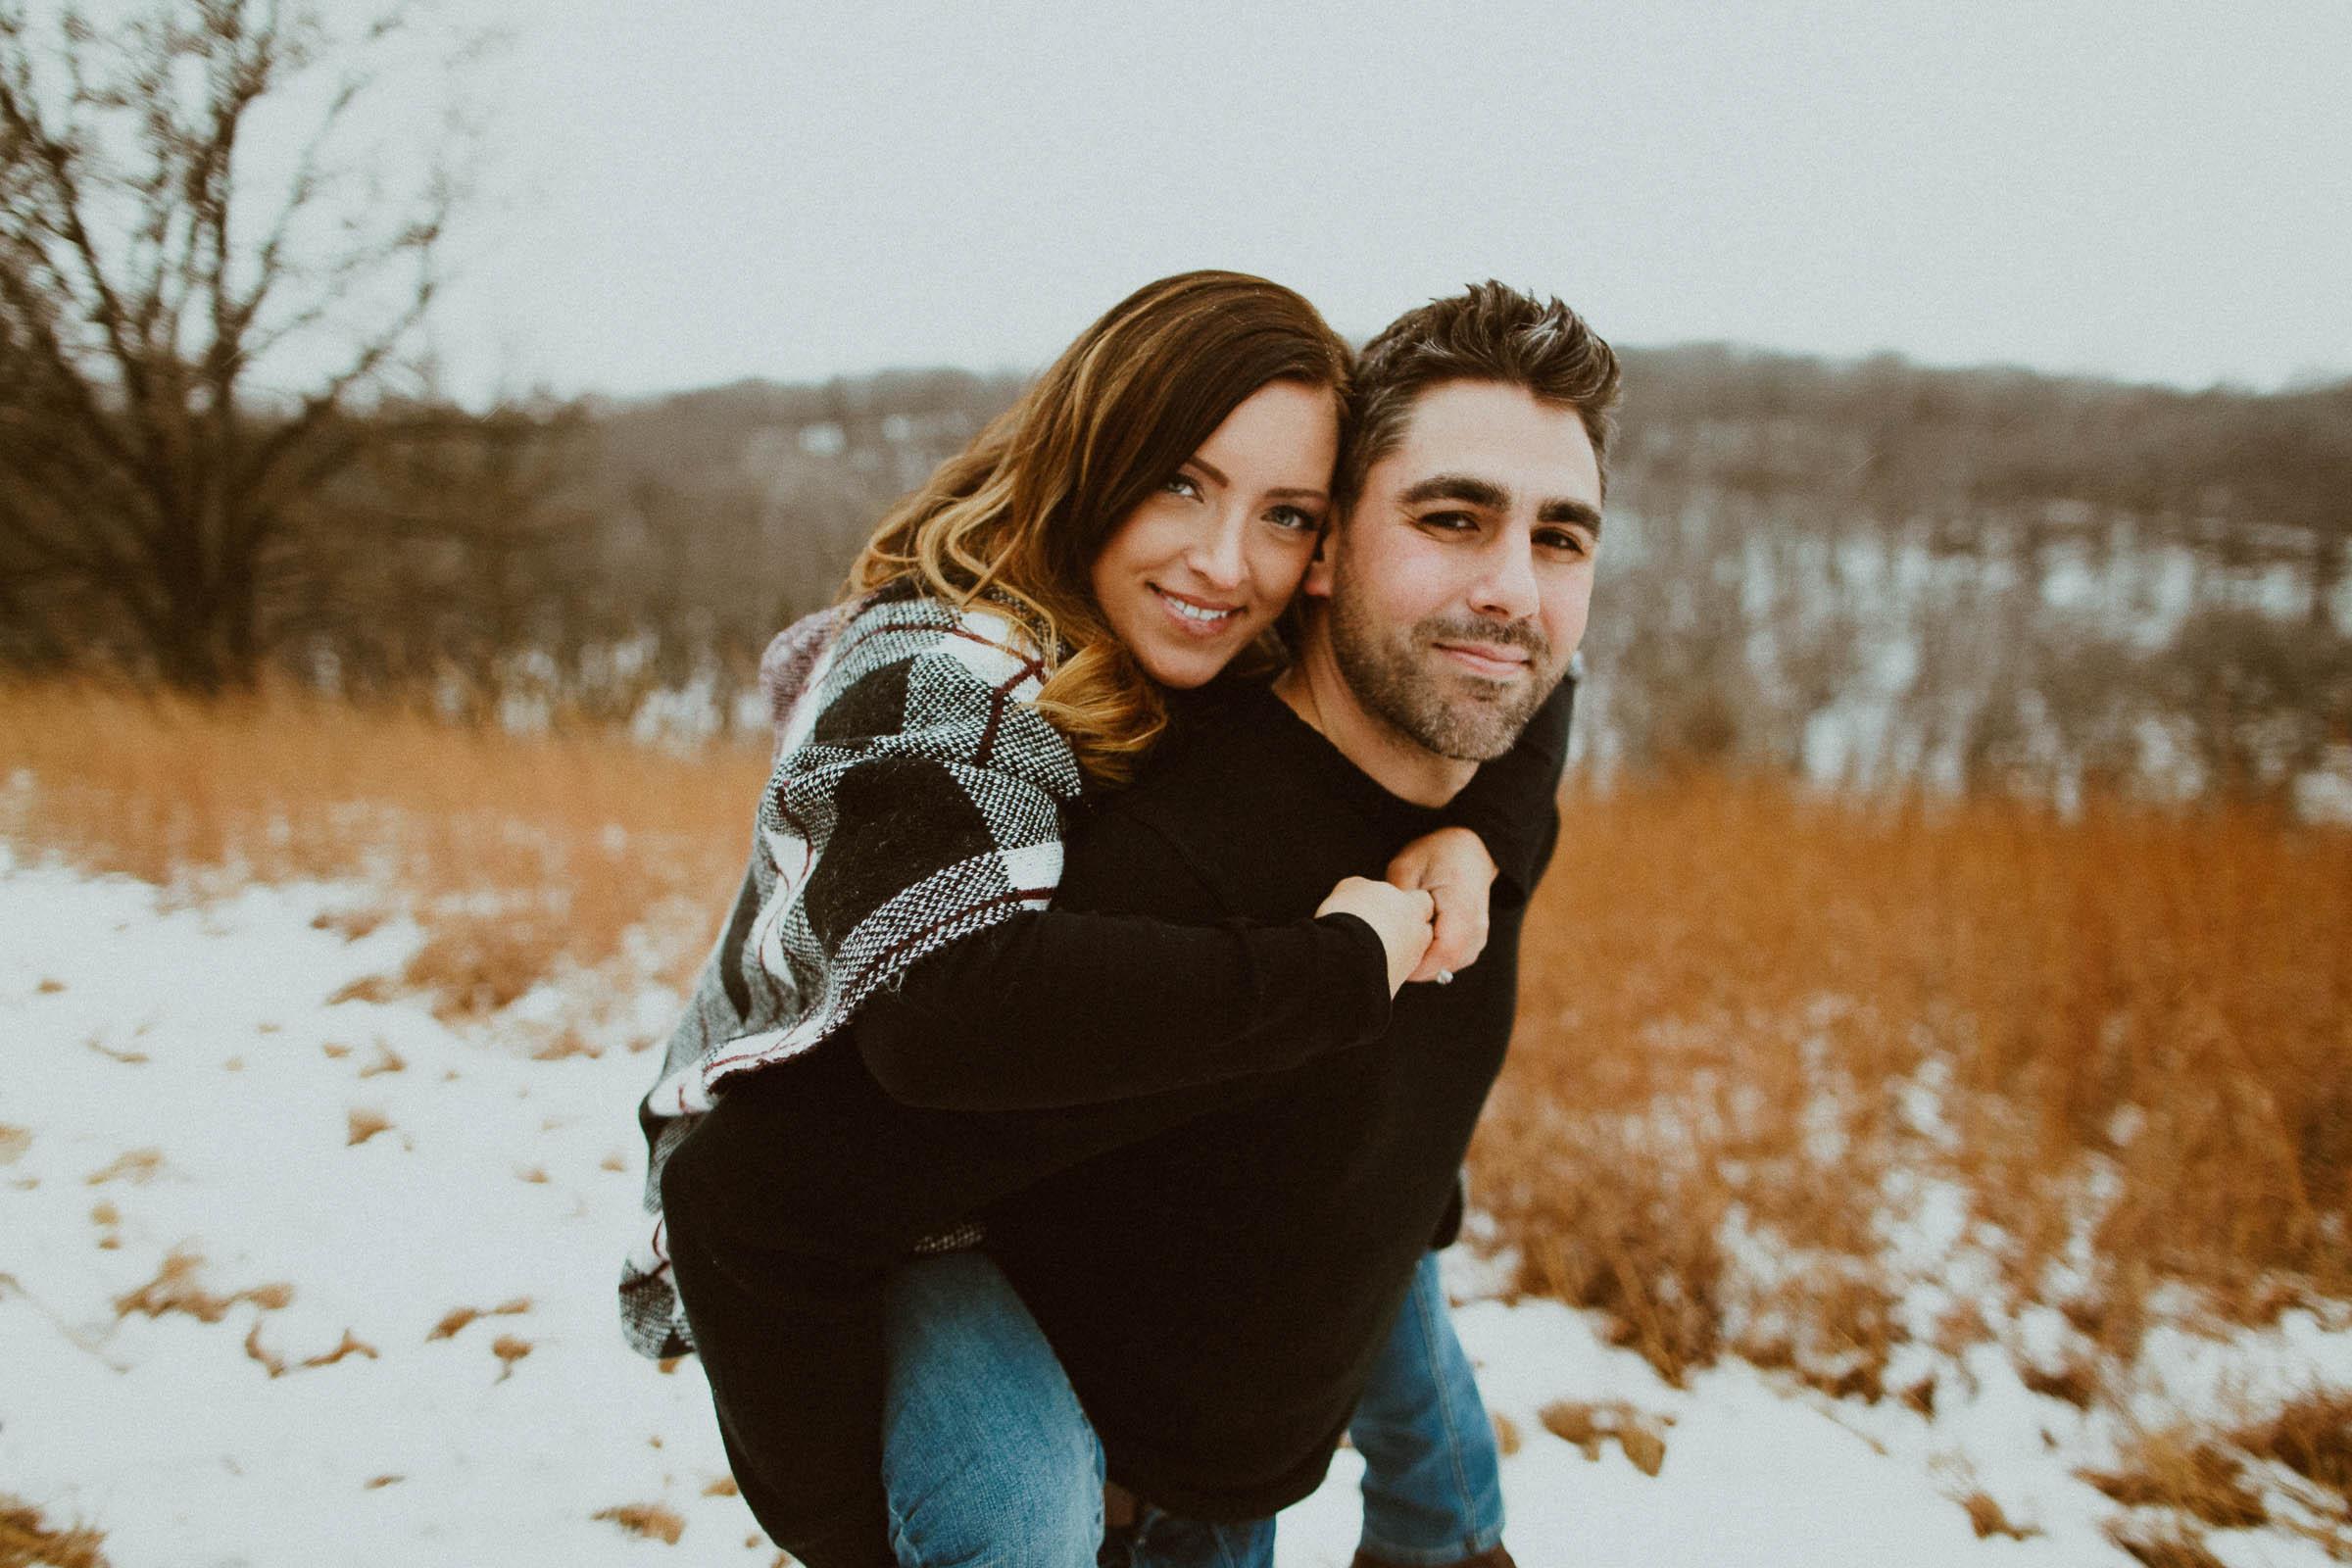 Nate + Jill  Snowy Omaha, Nebraska Engagement Session   VIEW